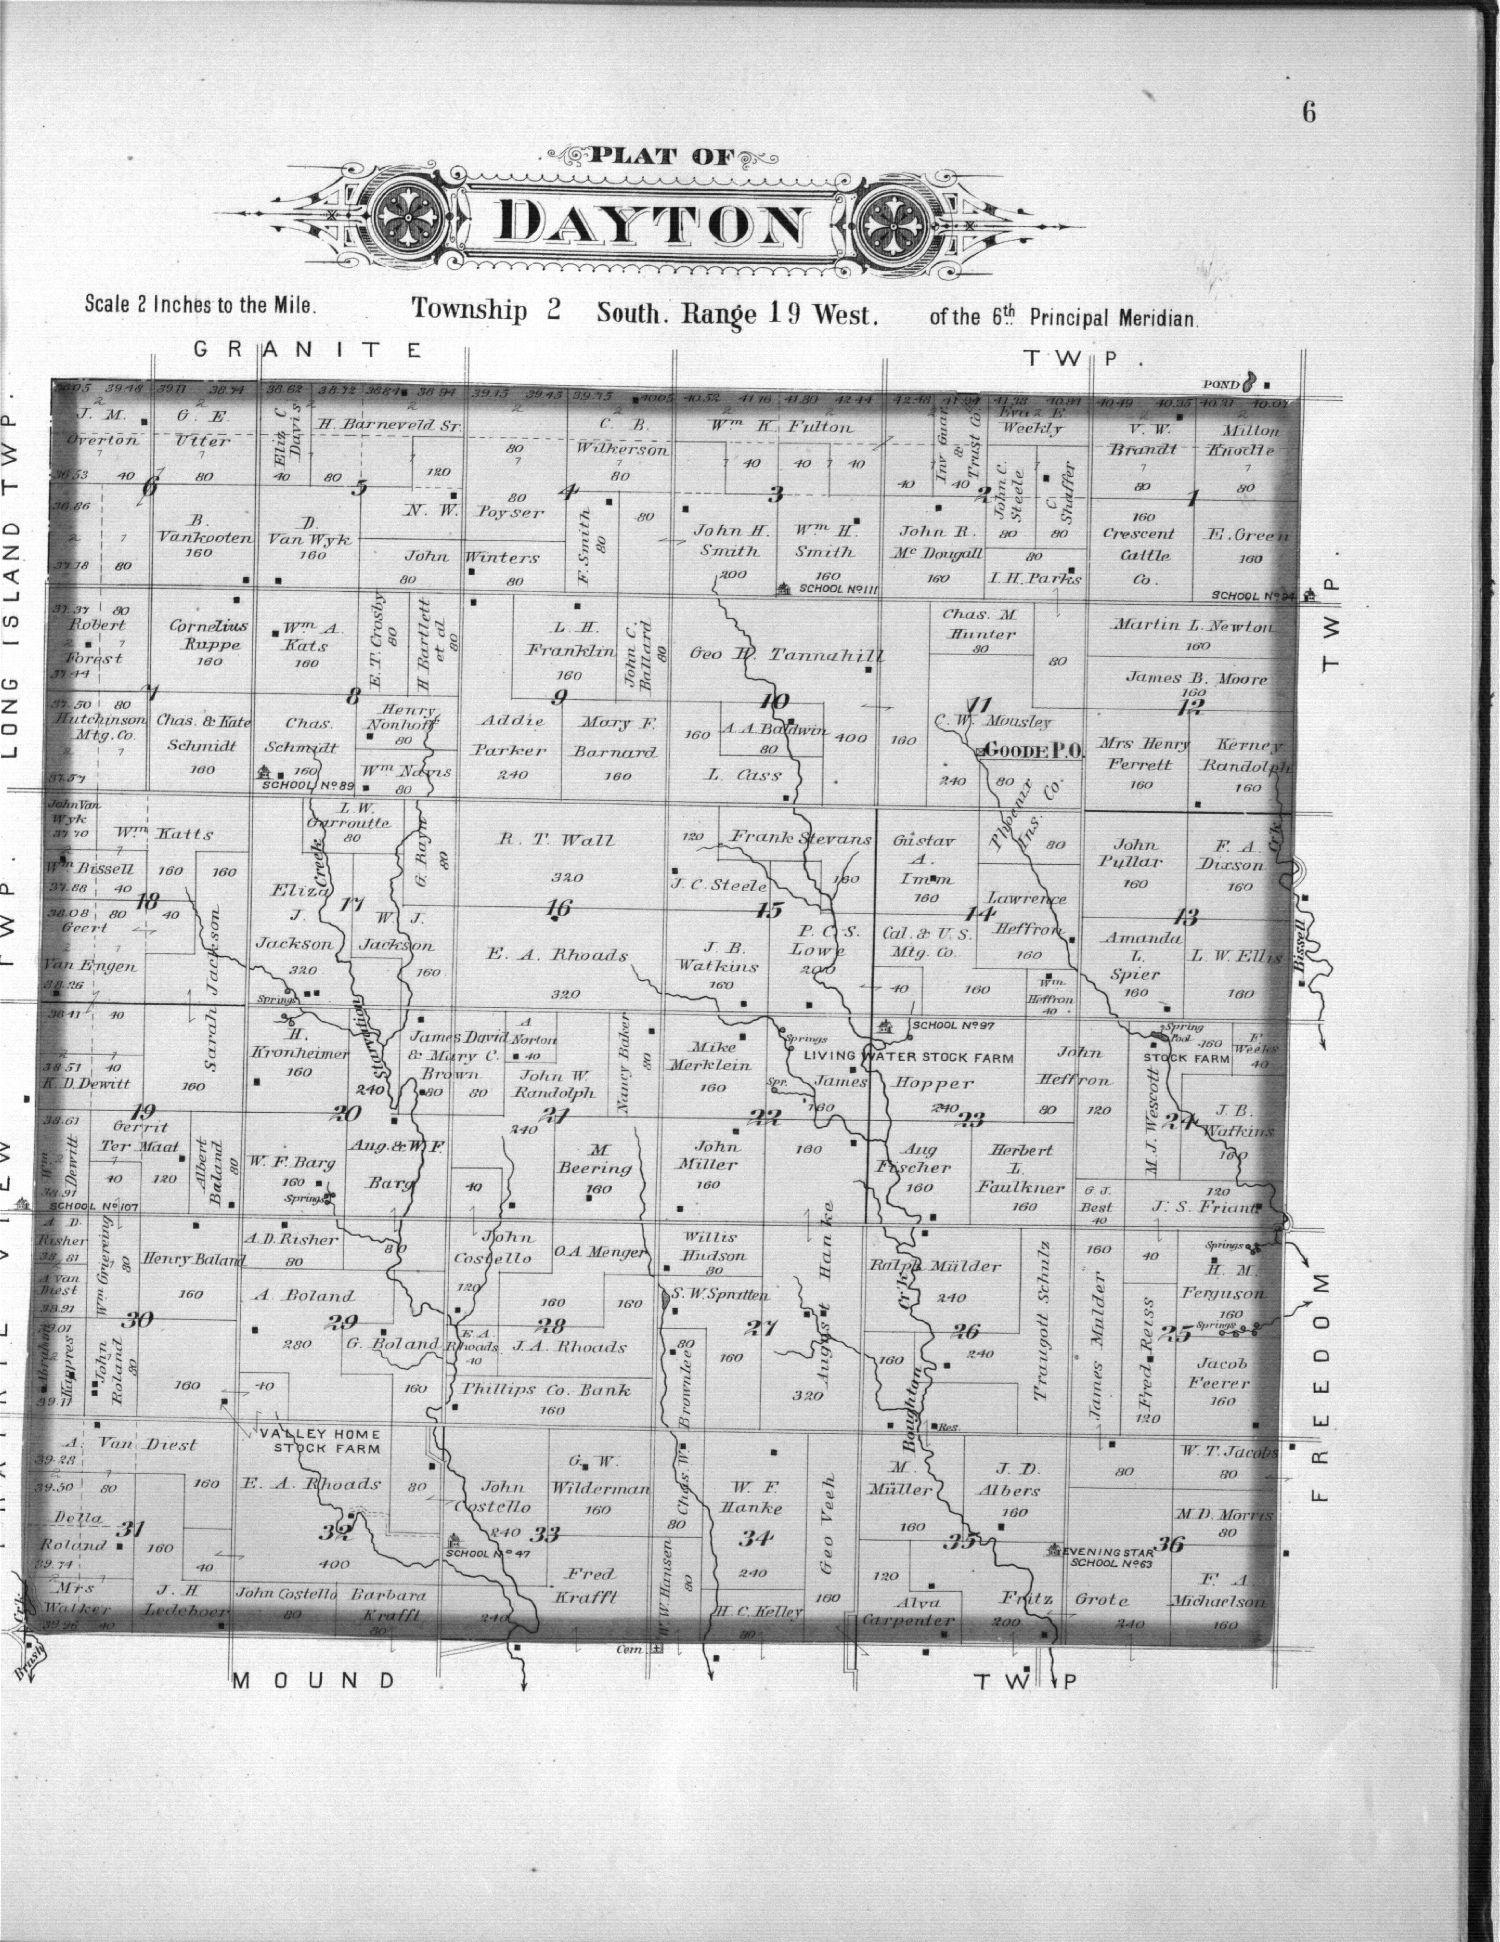 Plat book, Phillips County, Kansas - 6